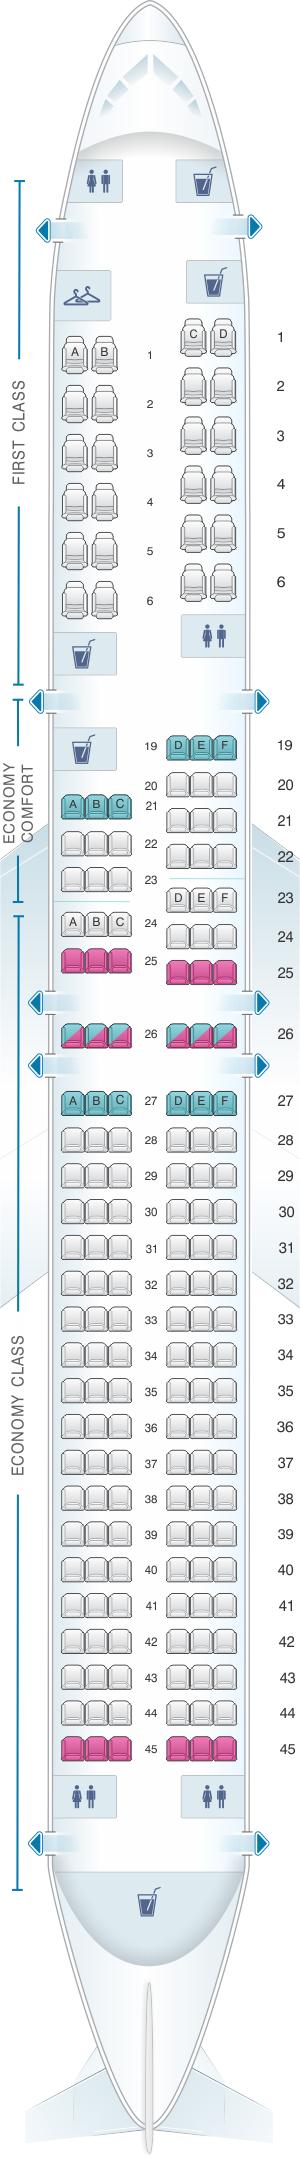 Delta flight seat assignment